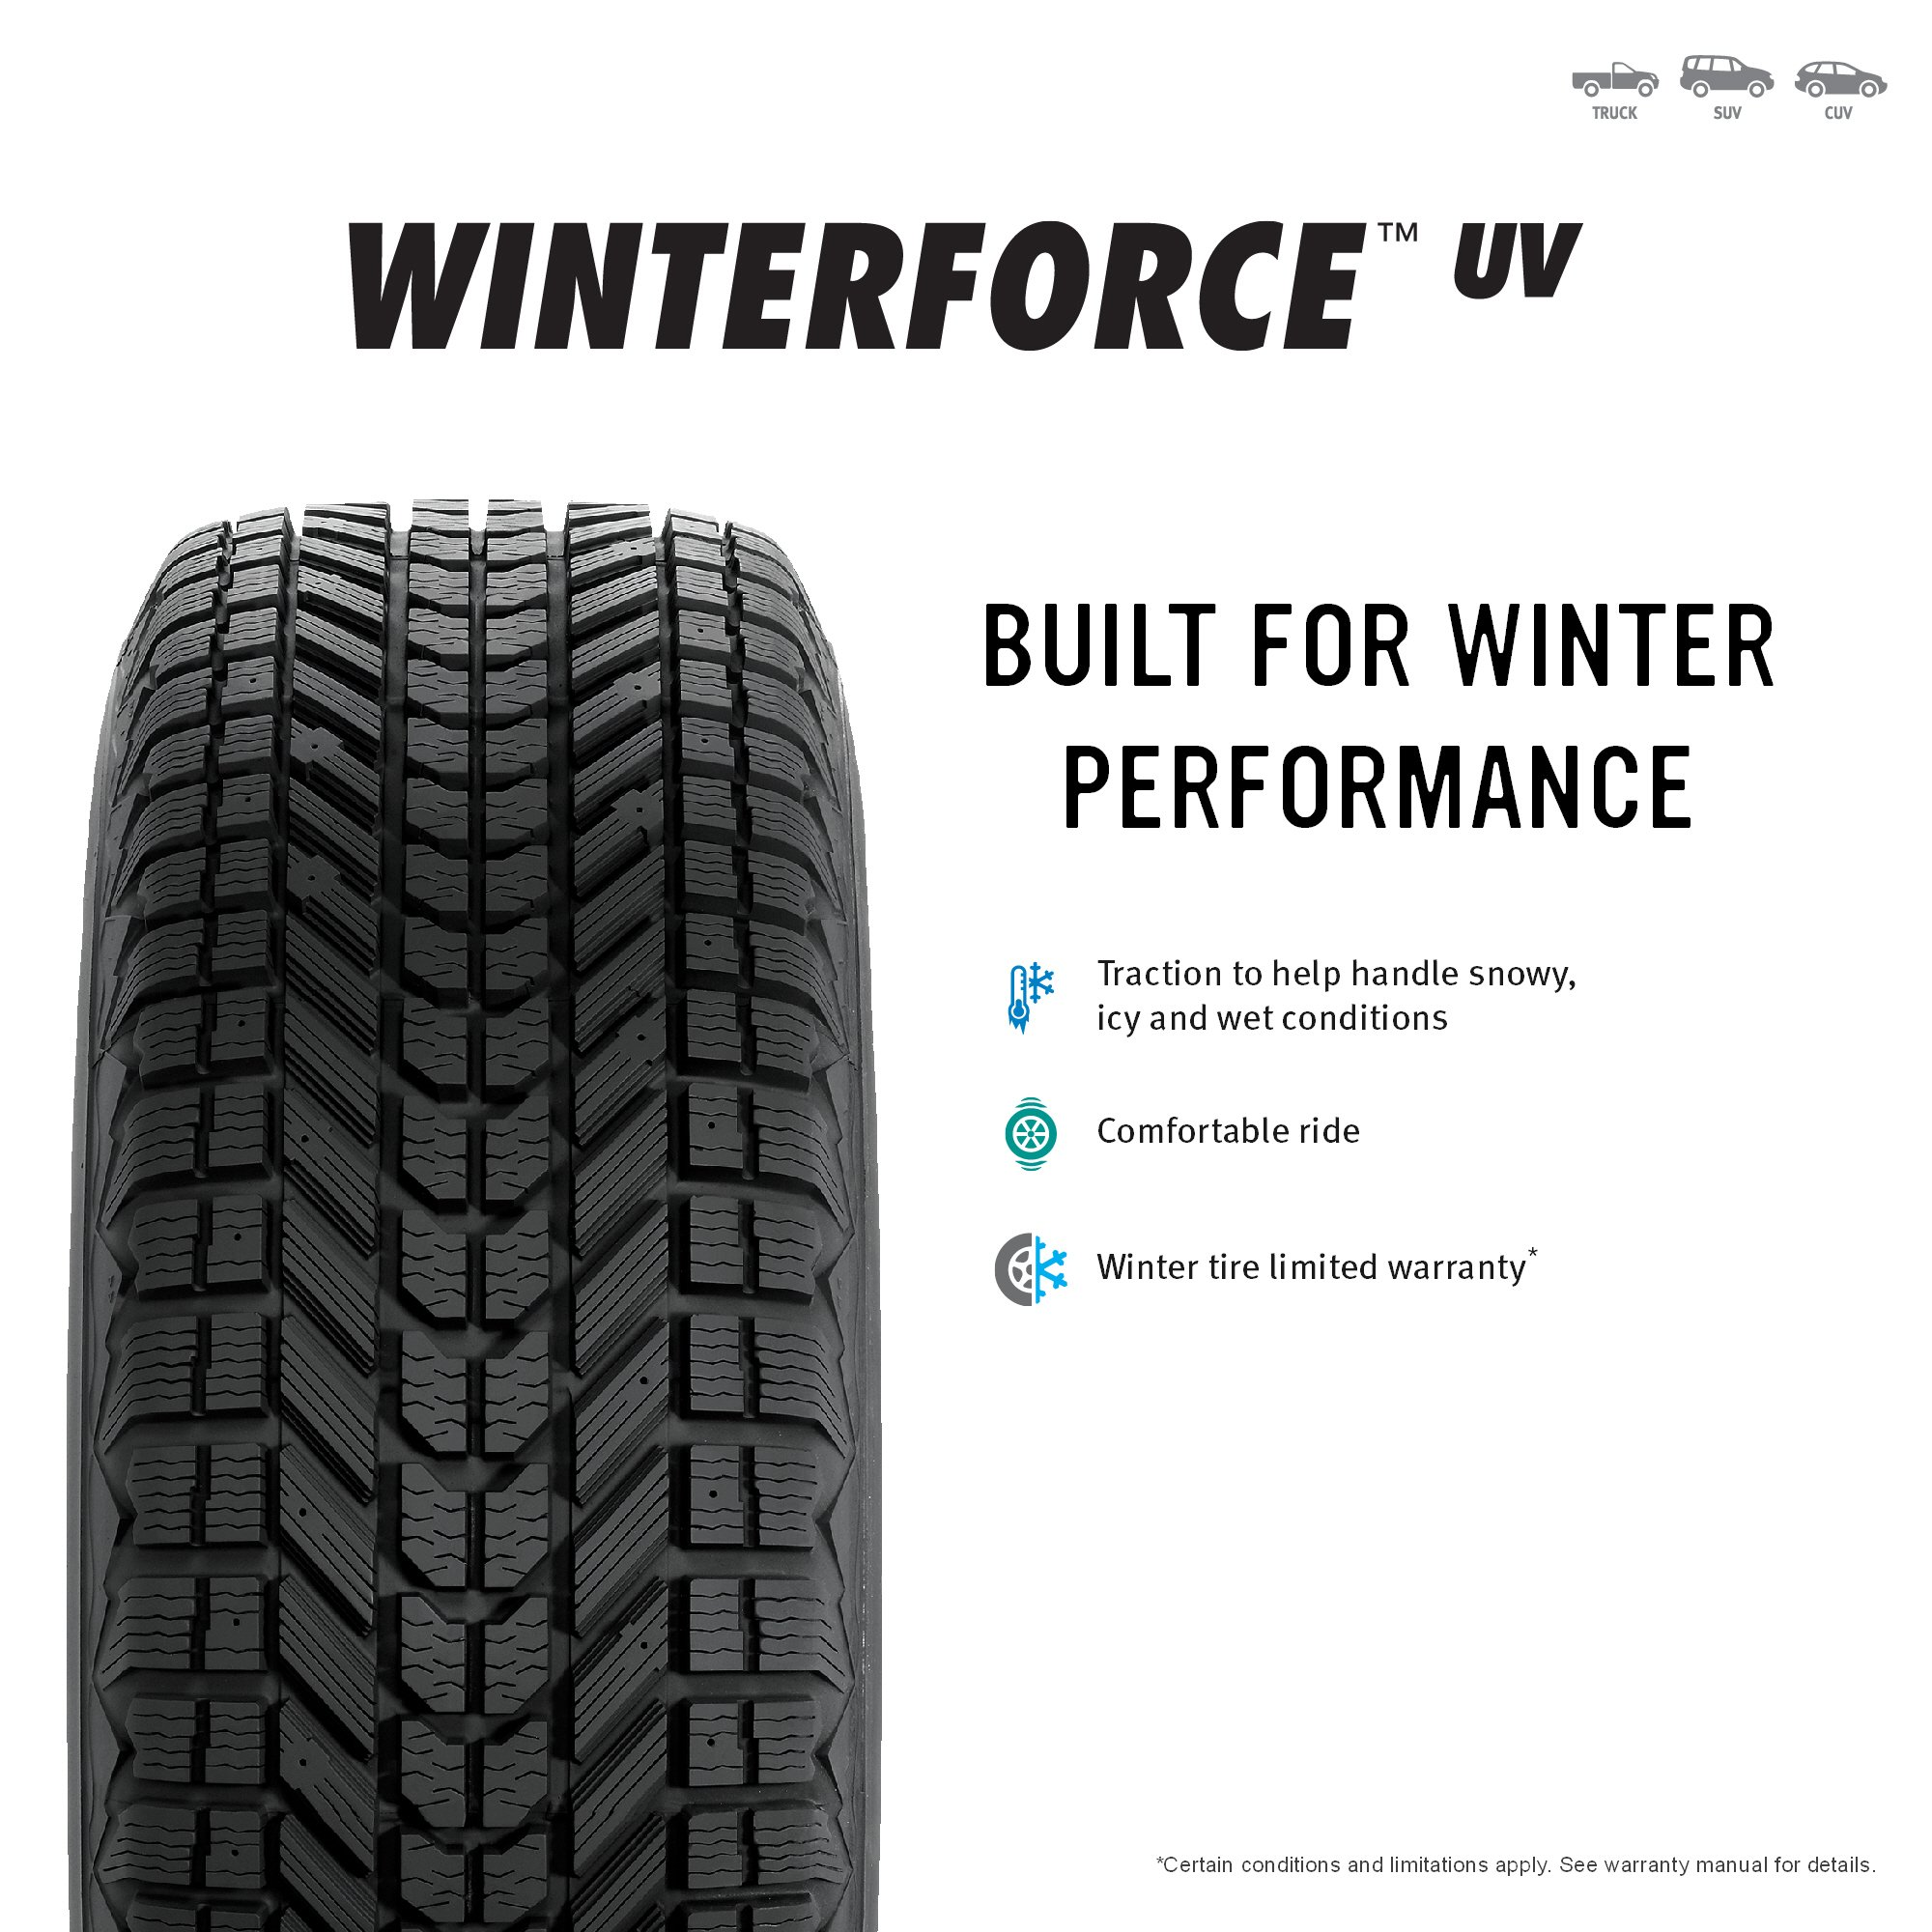 Firestone Winterforce UV Winter Radial Tire - 235/65R17 103S